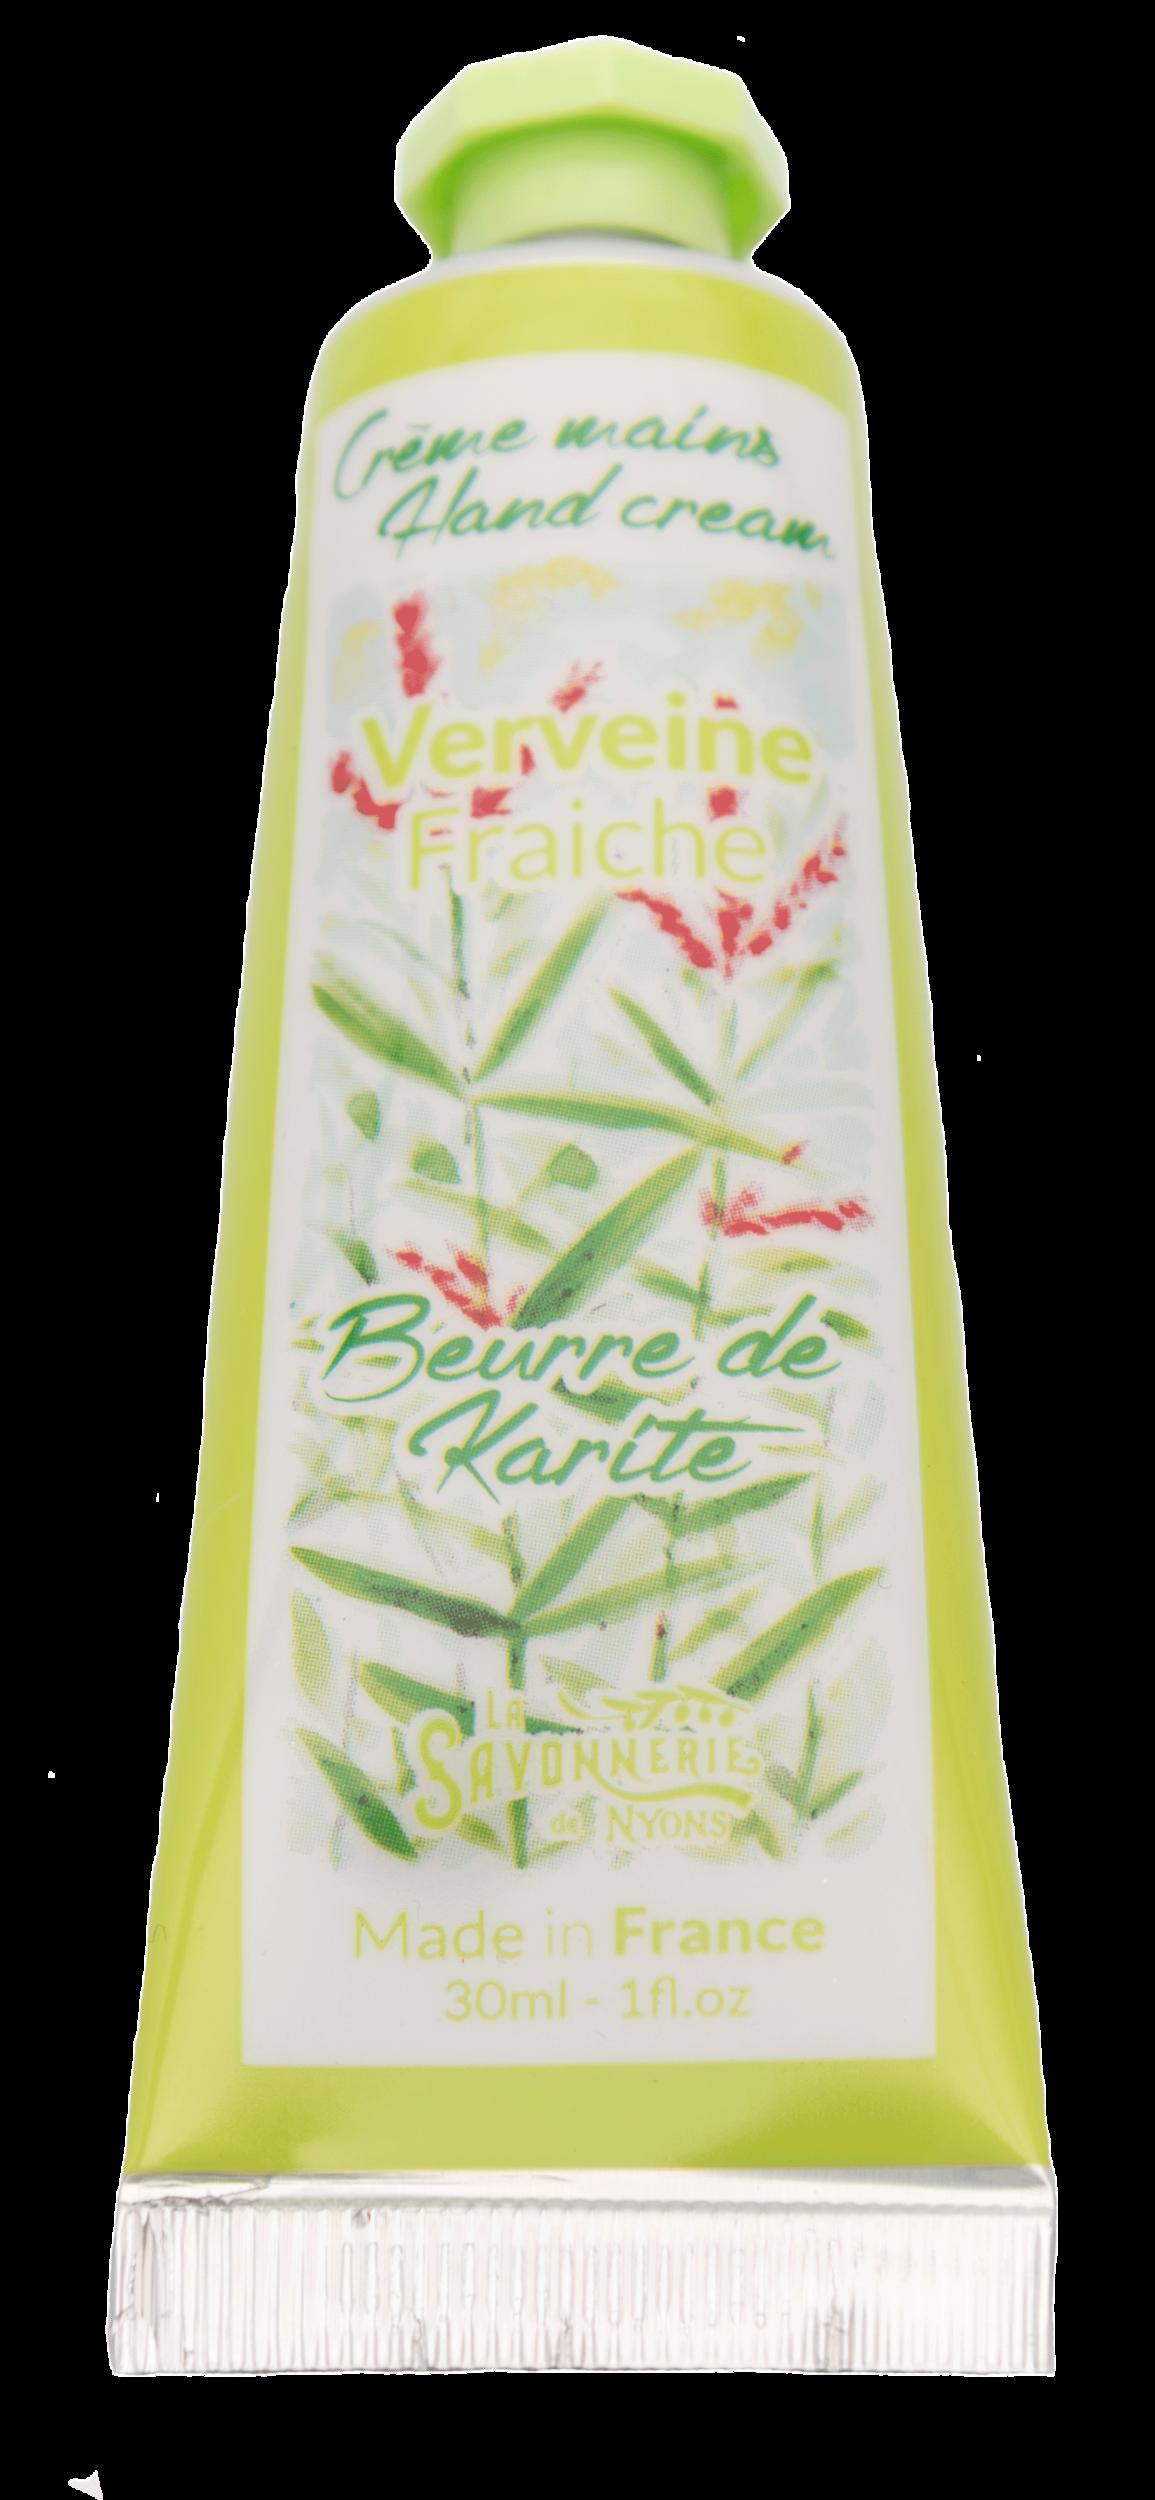 Crème Mains Aquarelle Verveine